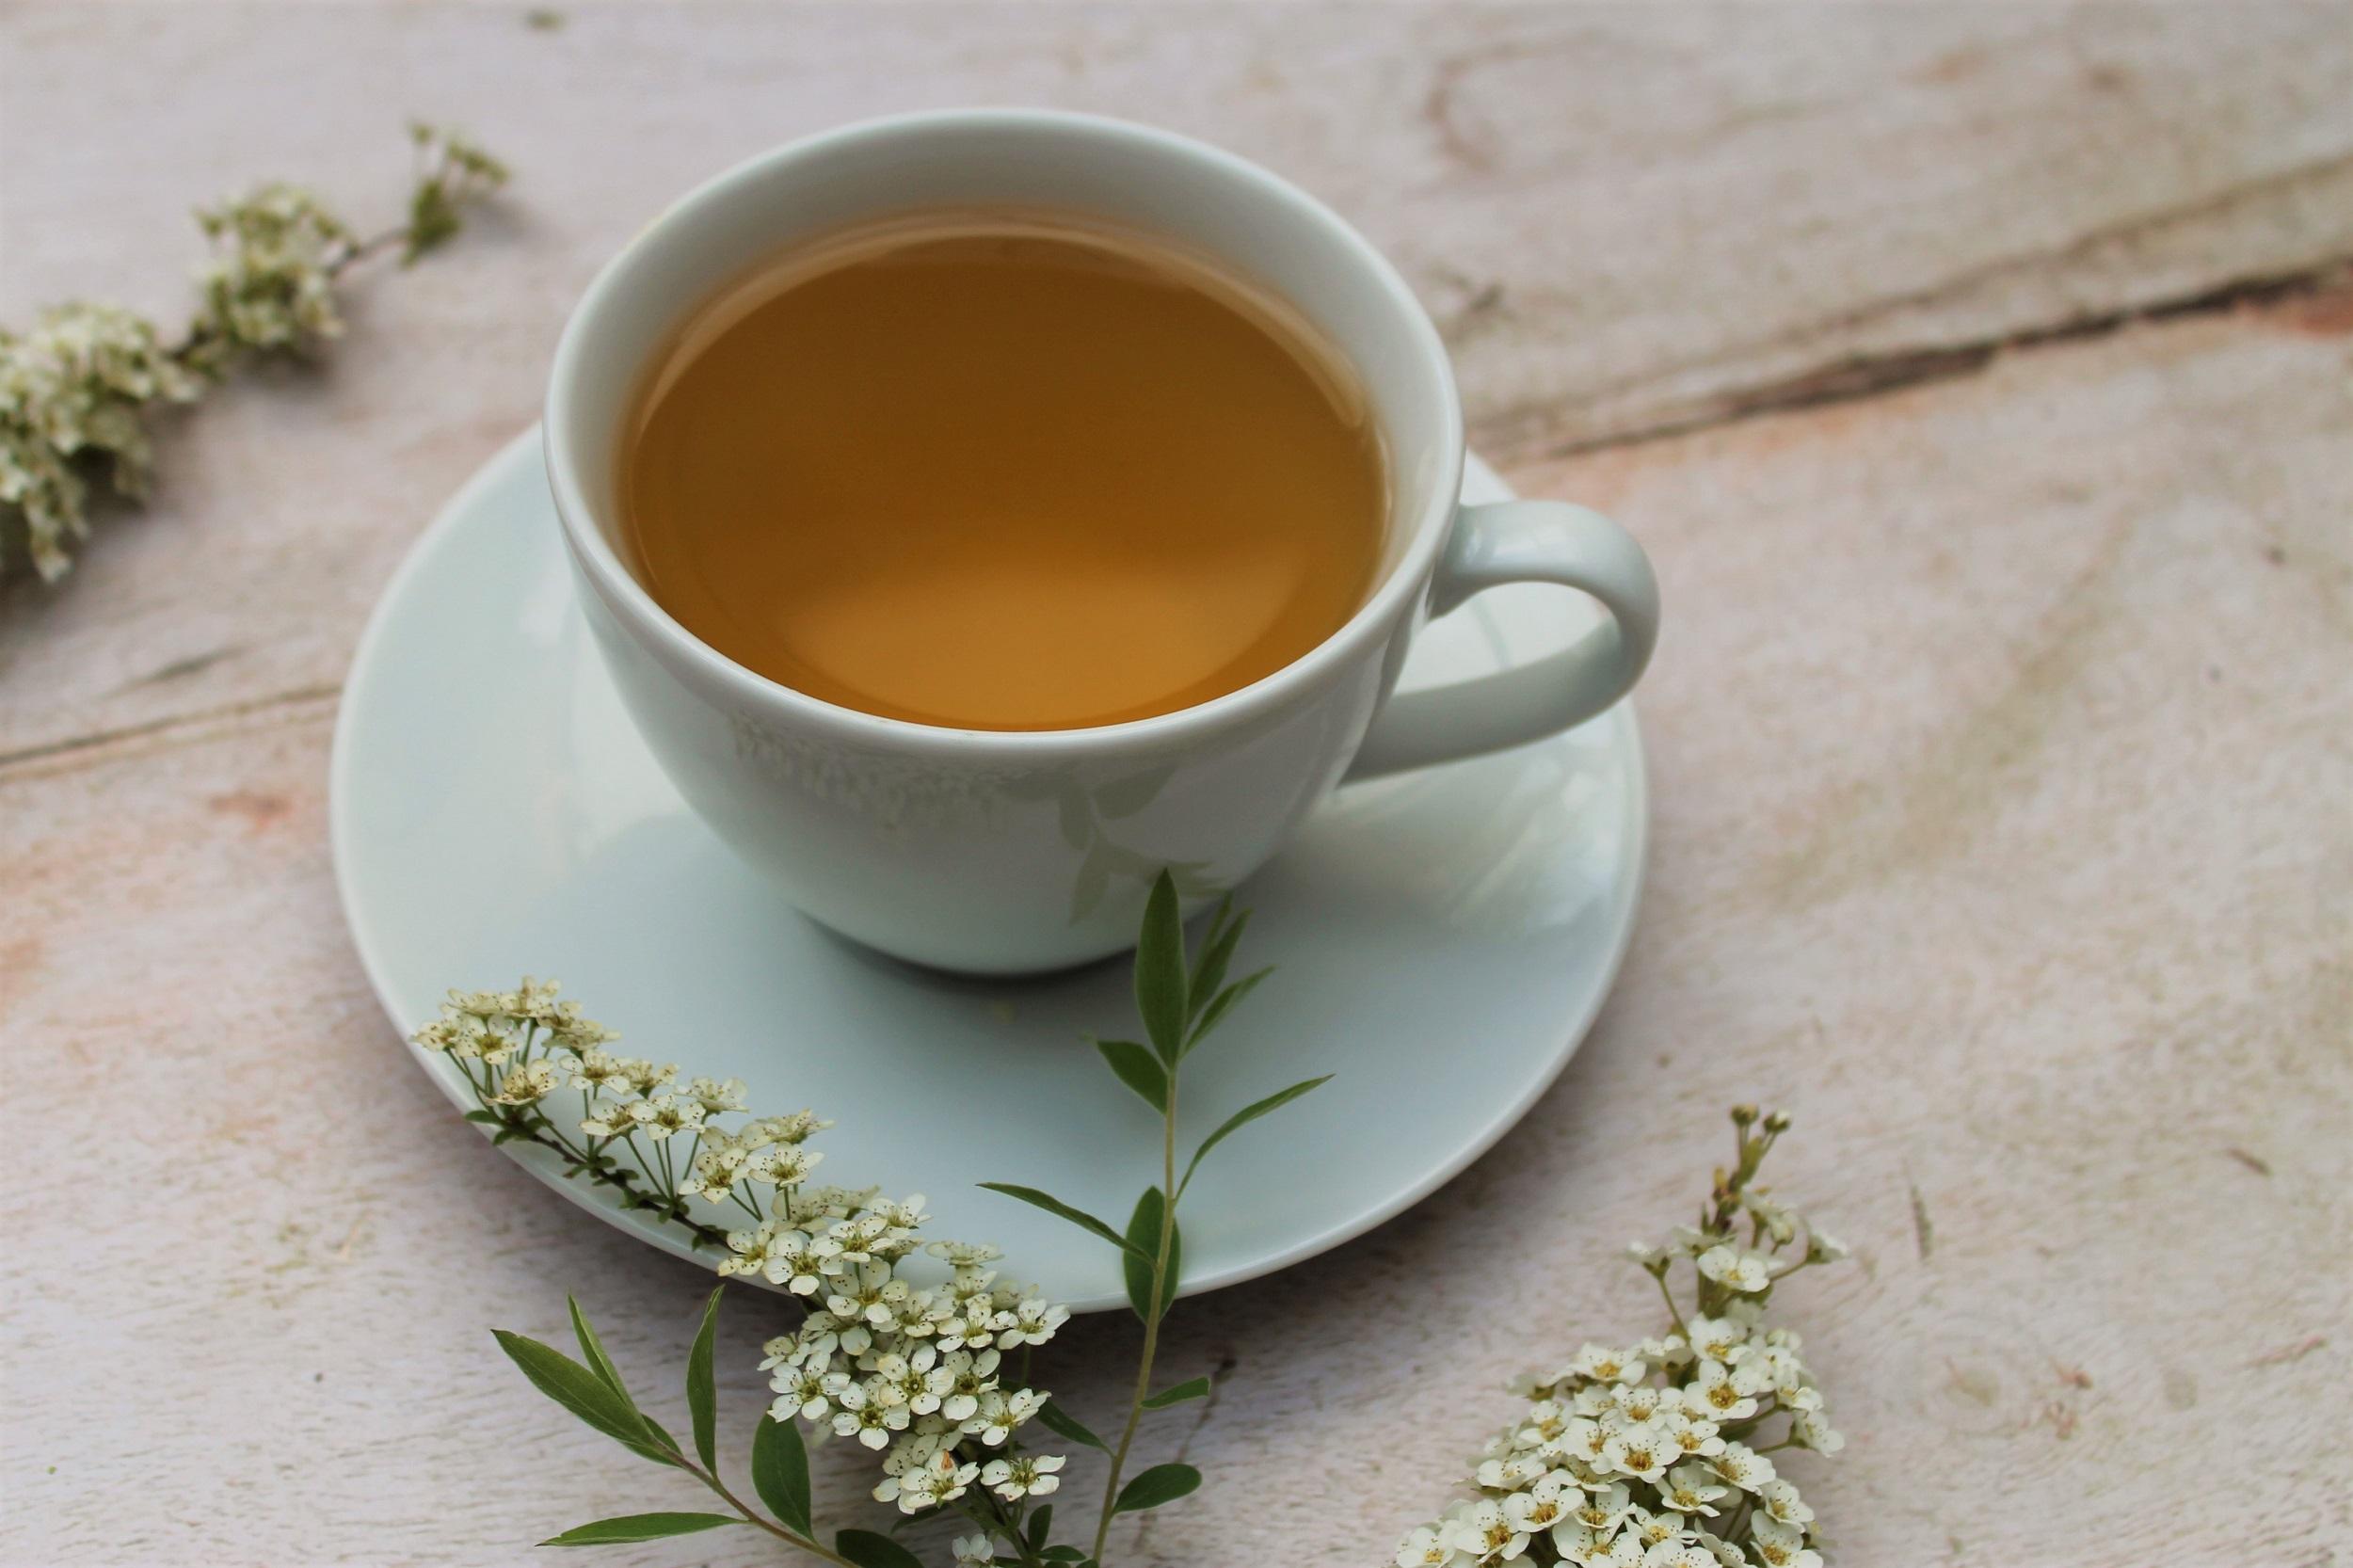 pure leaf green jasmine tea photography